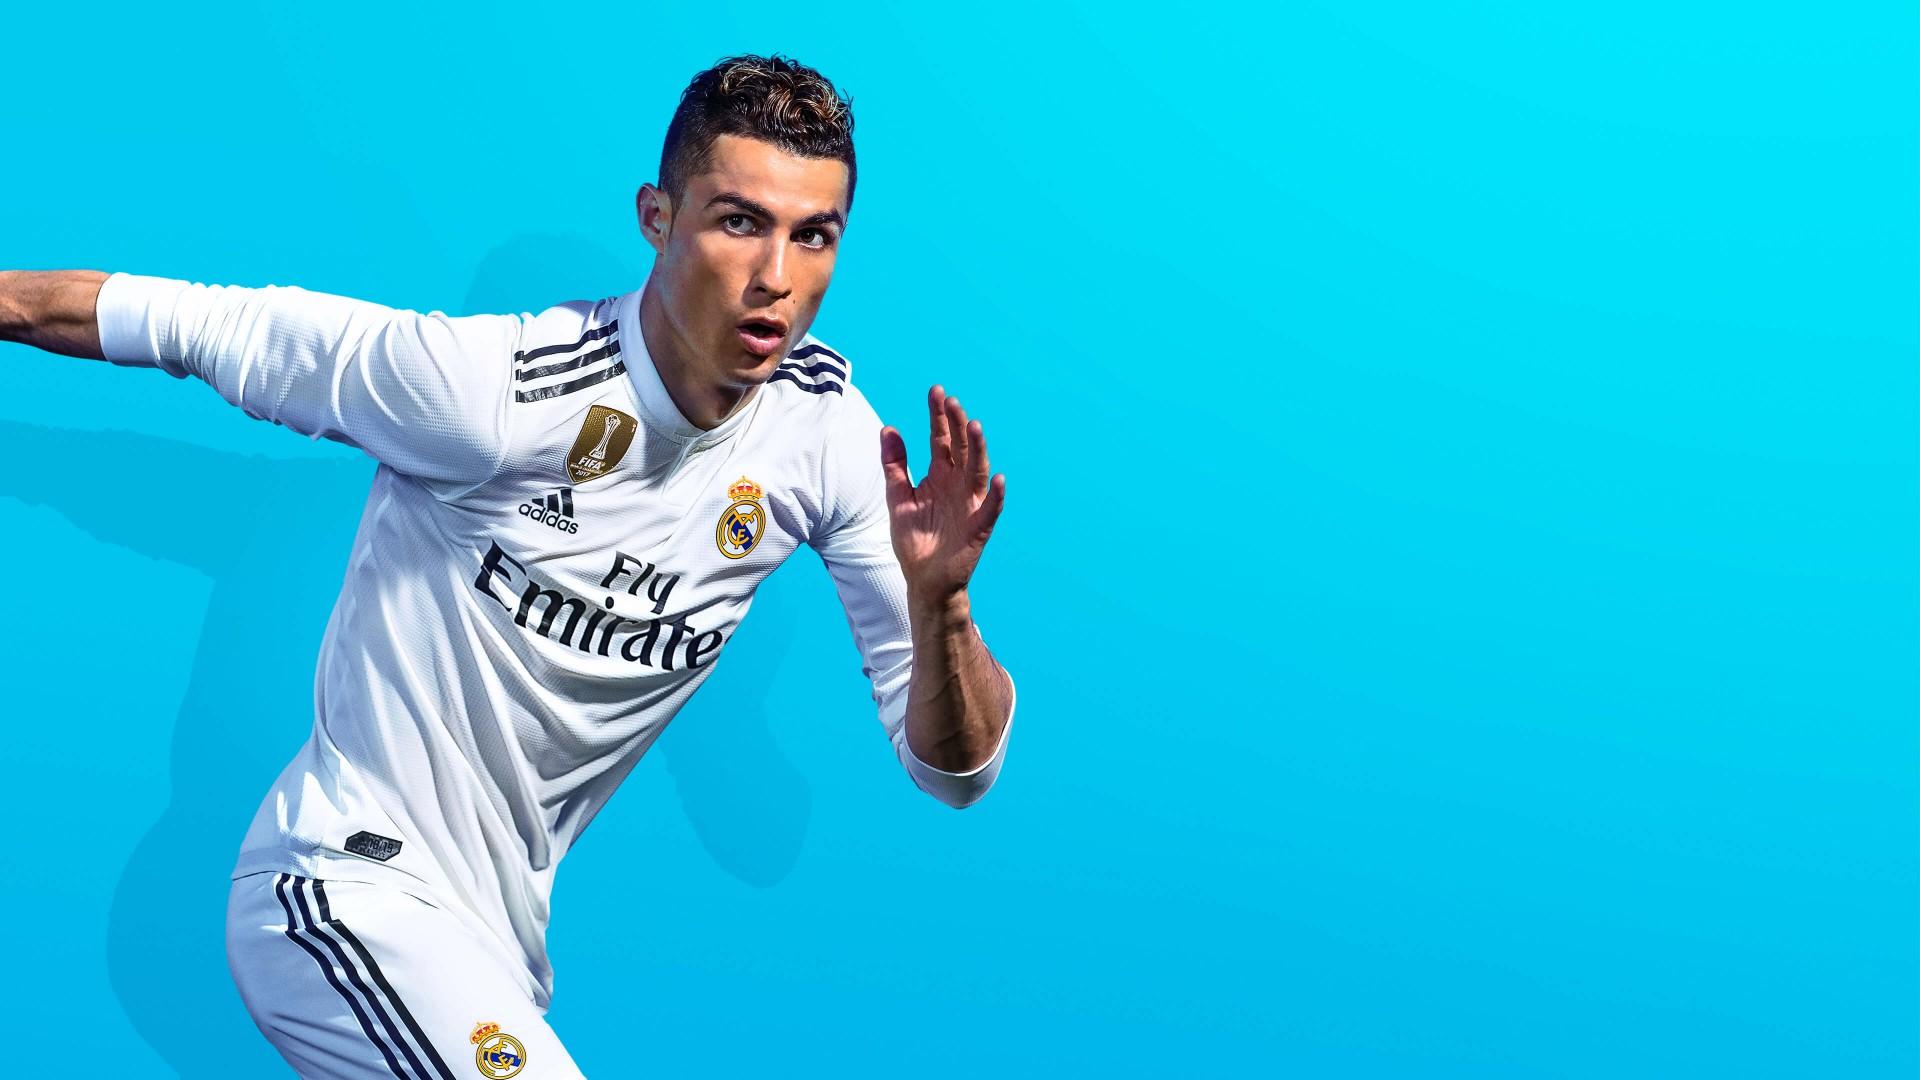 3d Wallpapers For Windows 7 1366x768 Cristiano Ronaldo In Fifa 19 4k Wallpapers Hd Wallpapers